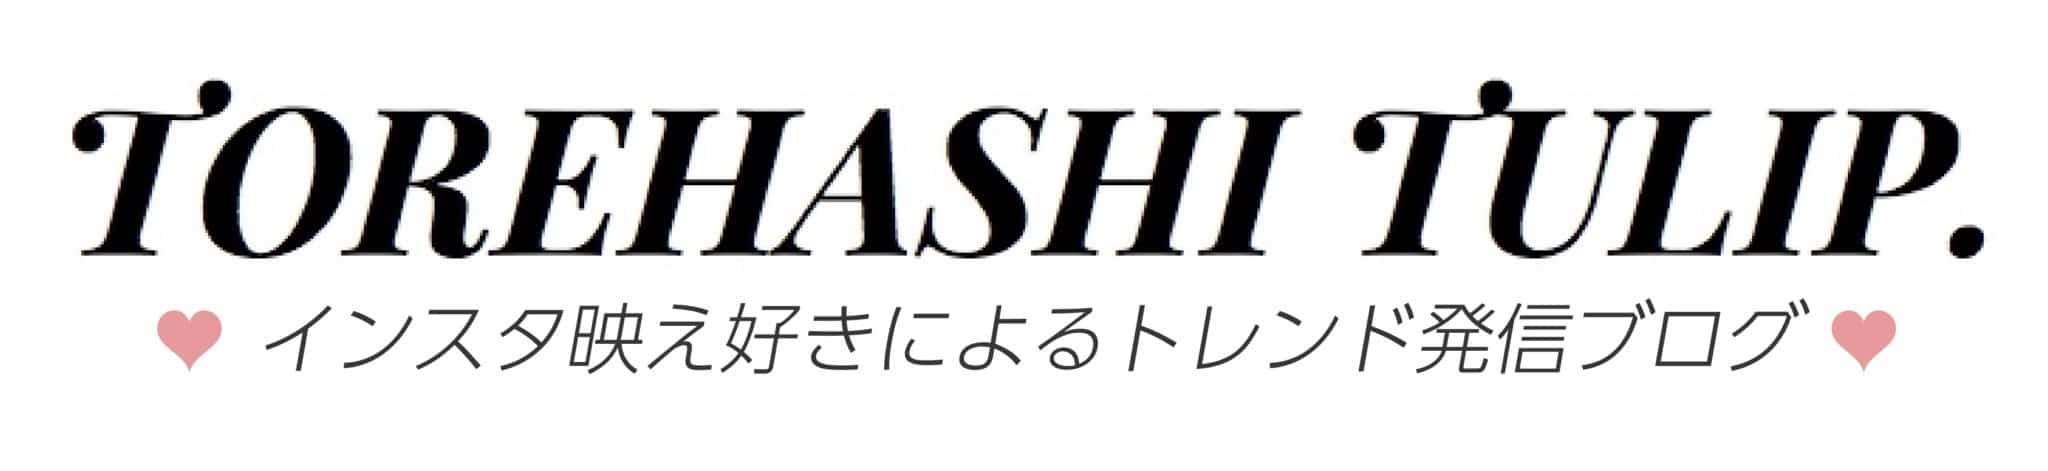 TOREHASHI TULIP.